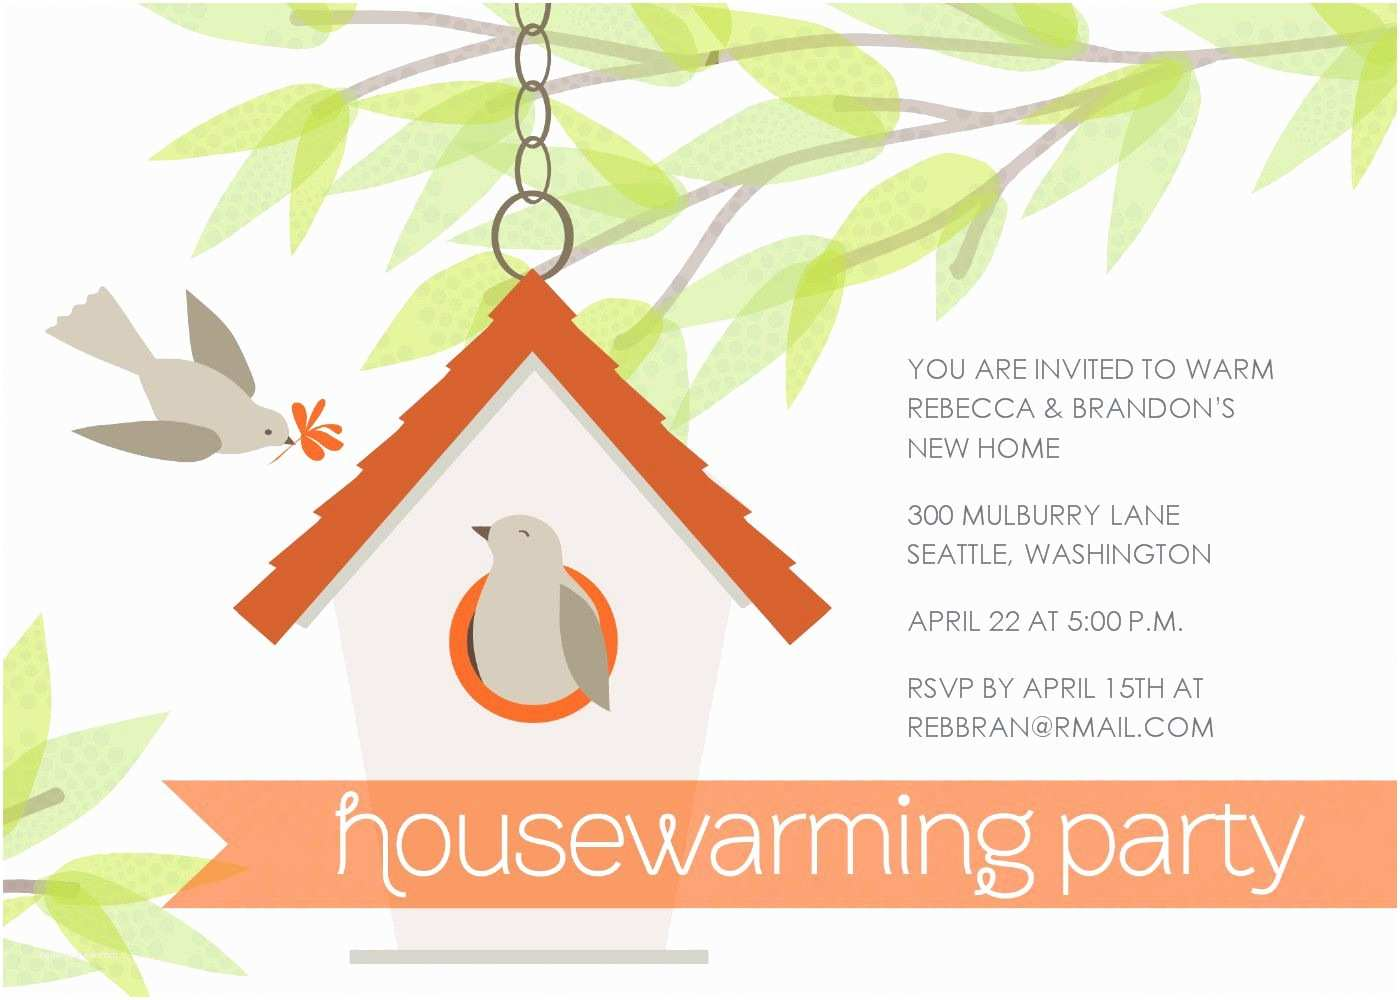 Housewarming Party Invitation Ideas Housewarming Invitations Cards Housewarming Invitation